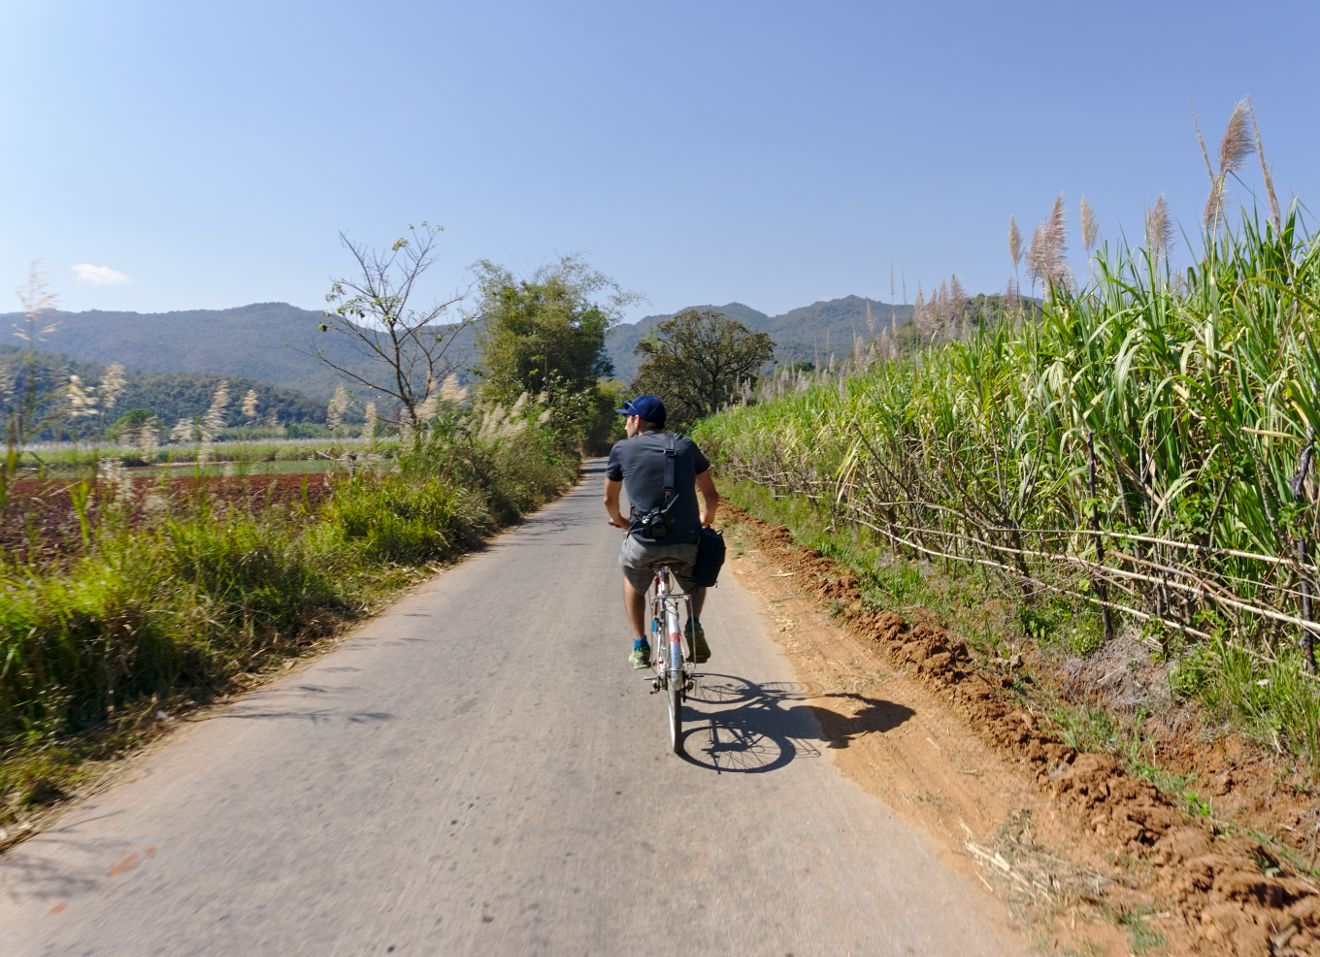 vélo dans la campagne birmane